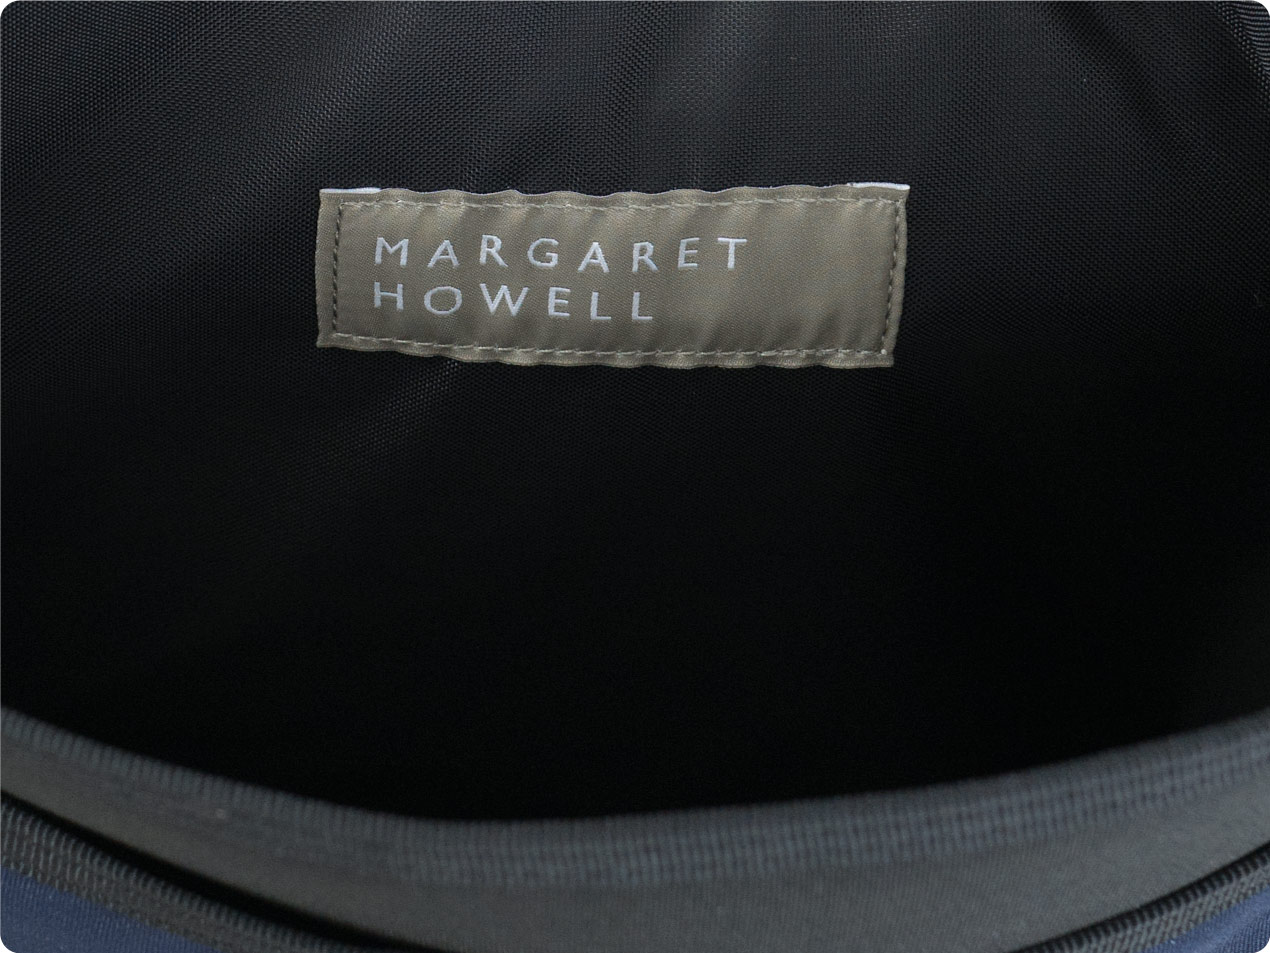 MARGARET HOWELL x PORTER CORDURA CANVAS A4 SIZE POUCH